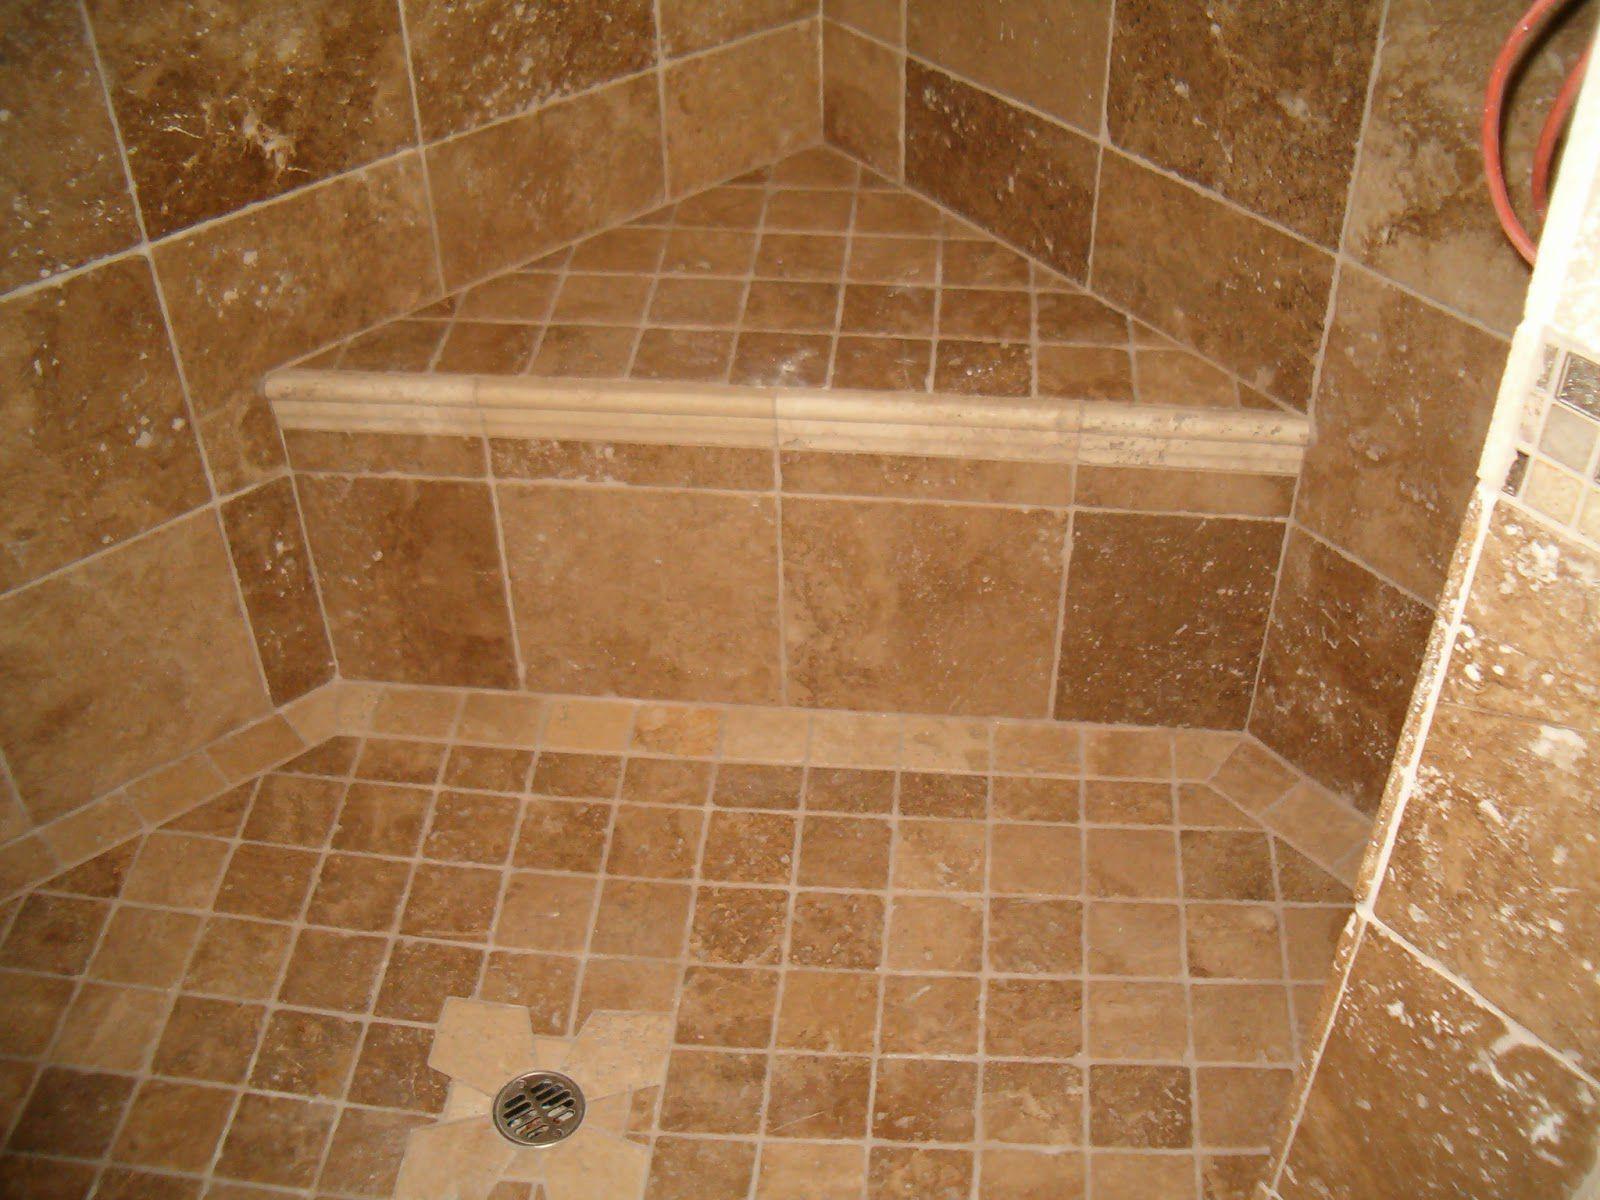 Ceramic Bathroom Tile Ideas  Httpviralom082150Ceramic Alluring Ceramic Tile Ideas For Small Bathrooms Design Inspiration